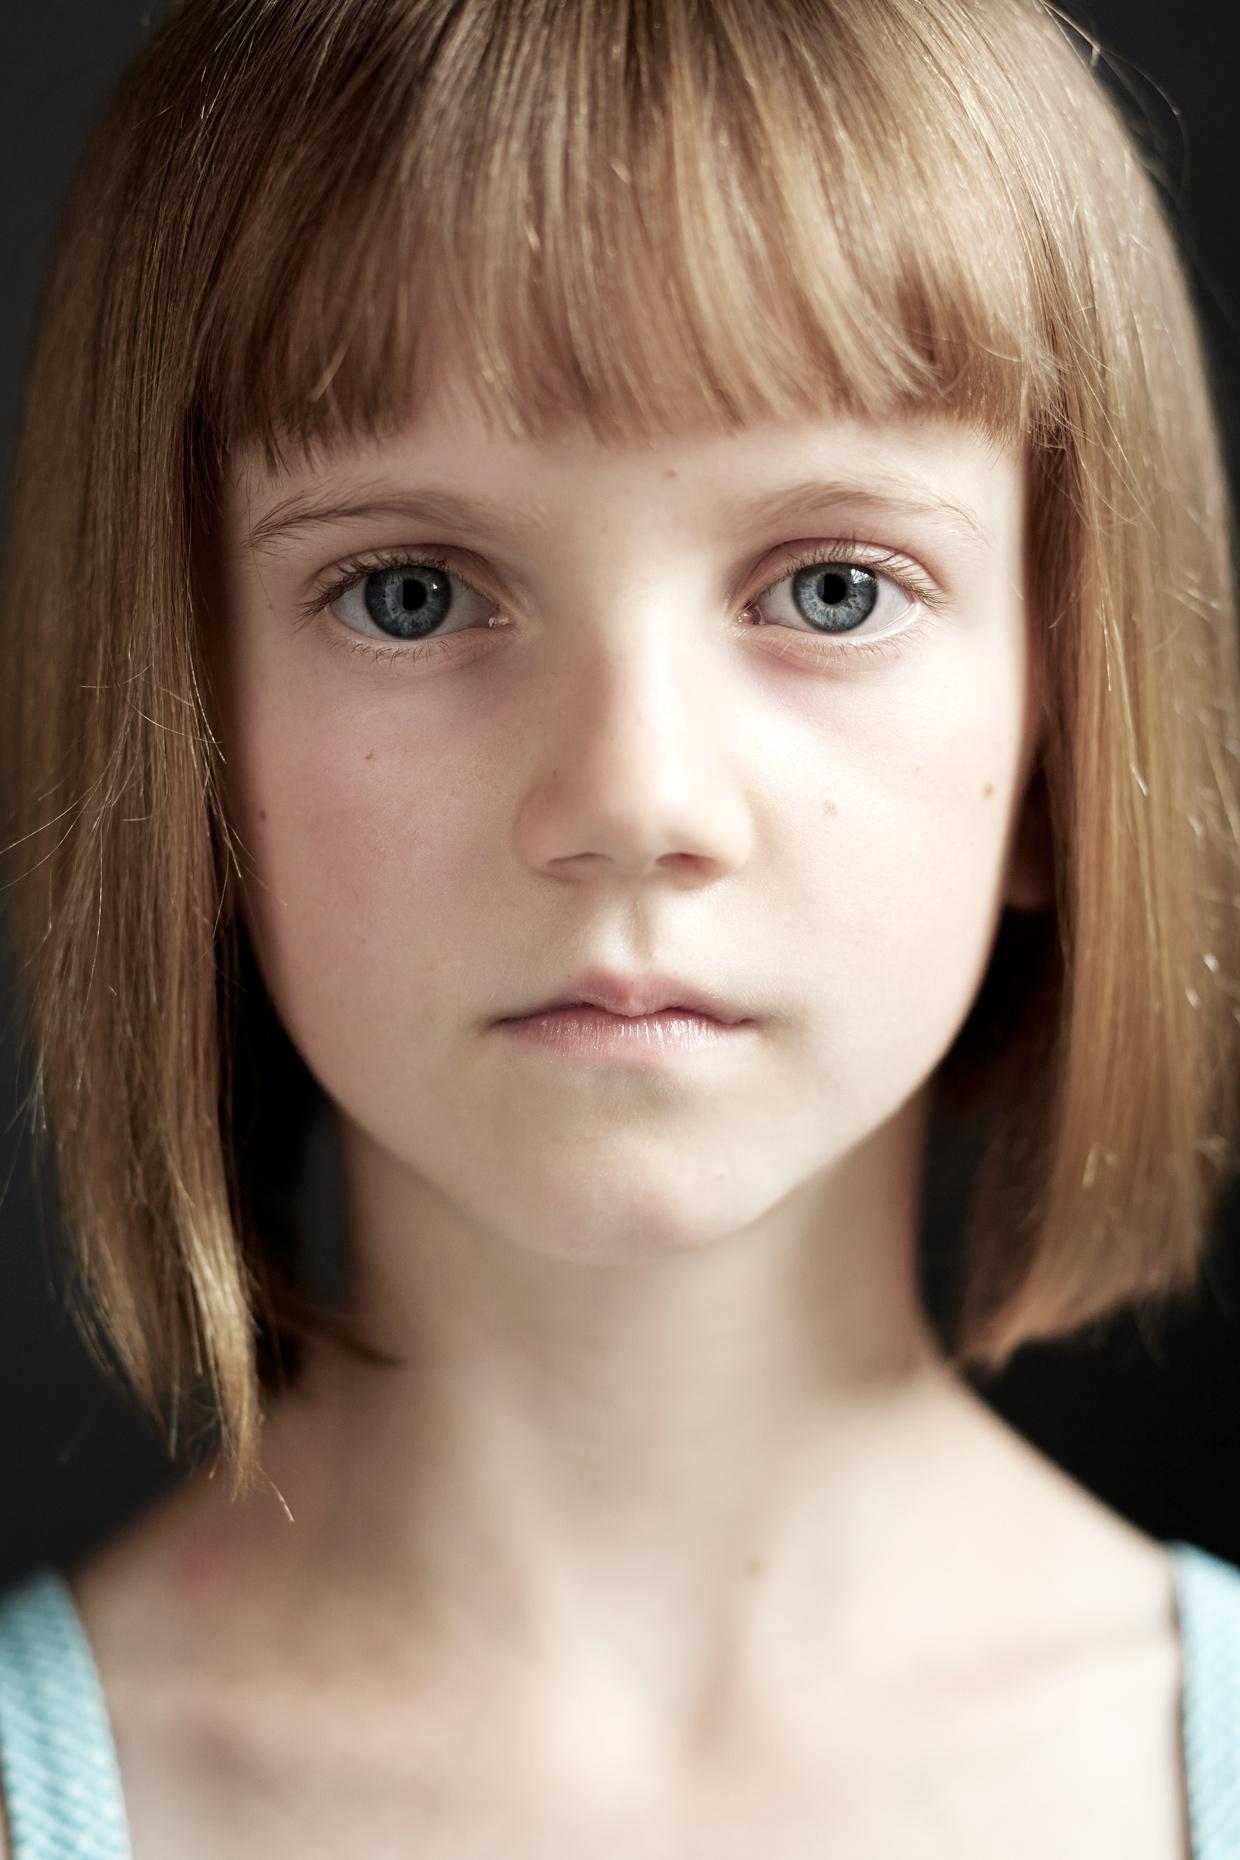 Portrait Photography Derek Israelsen Kid Closeup Serious